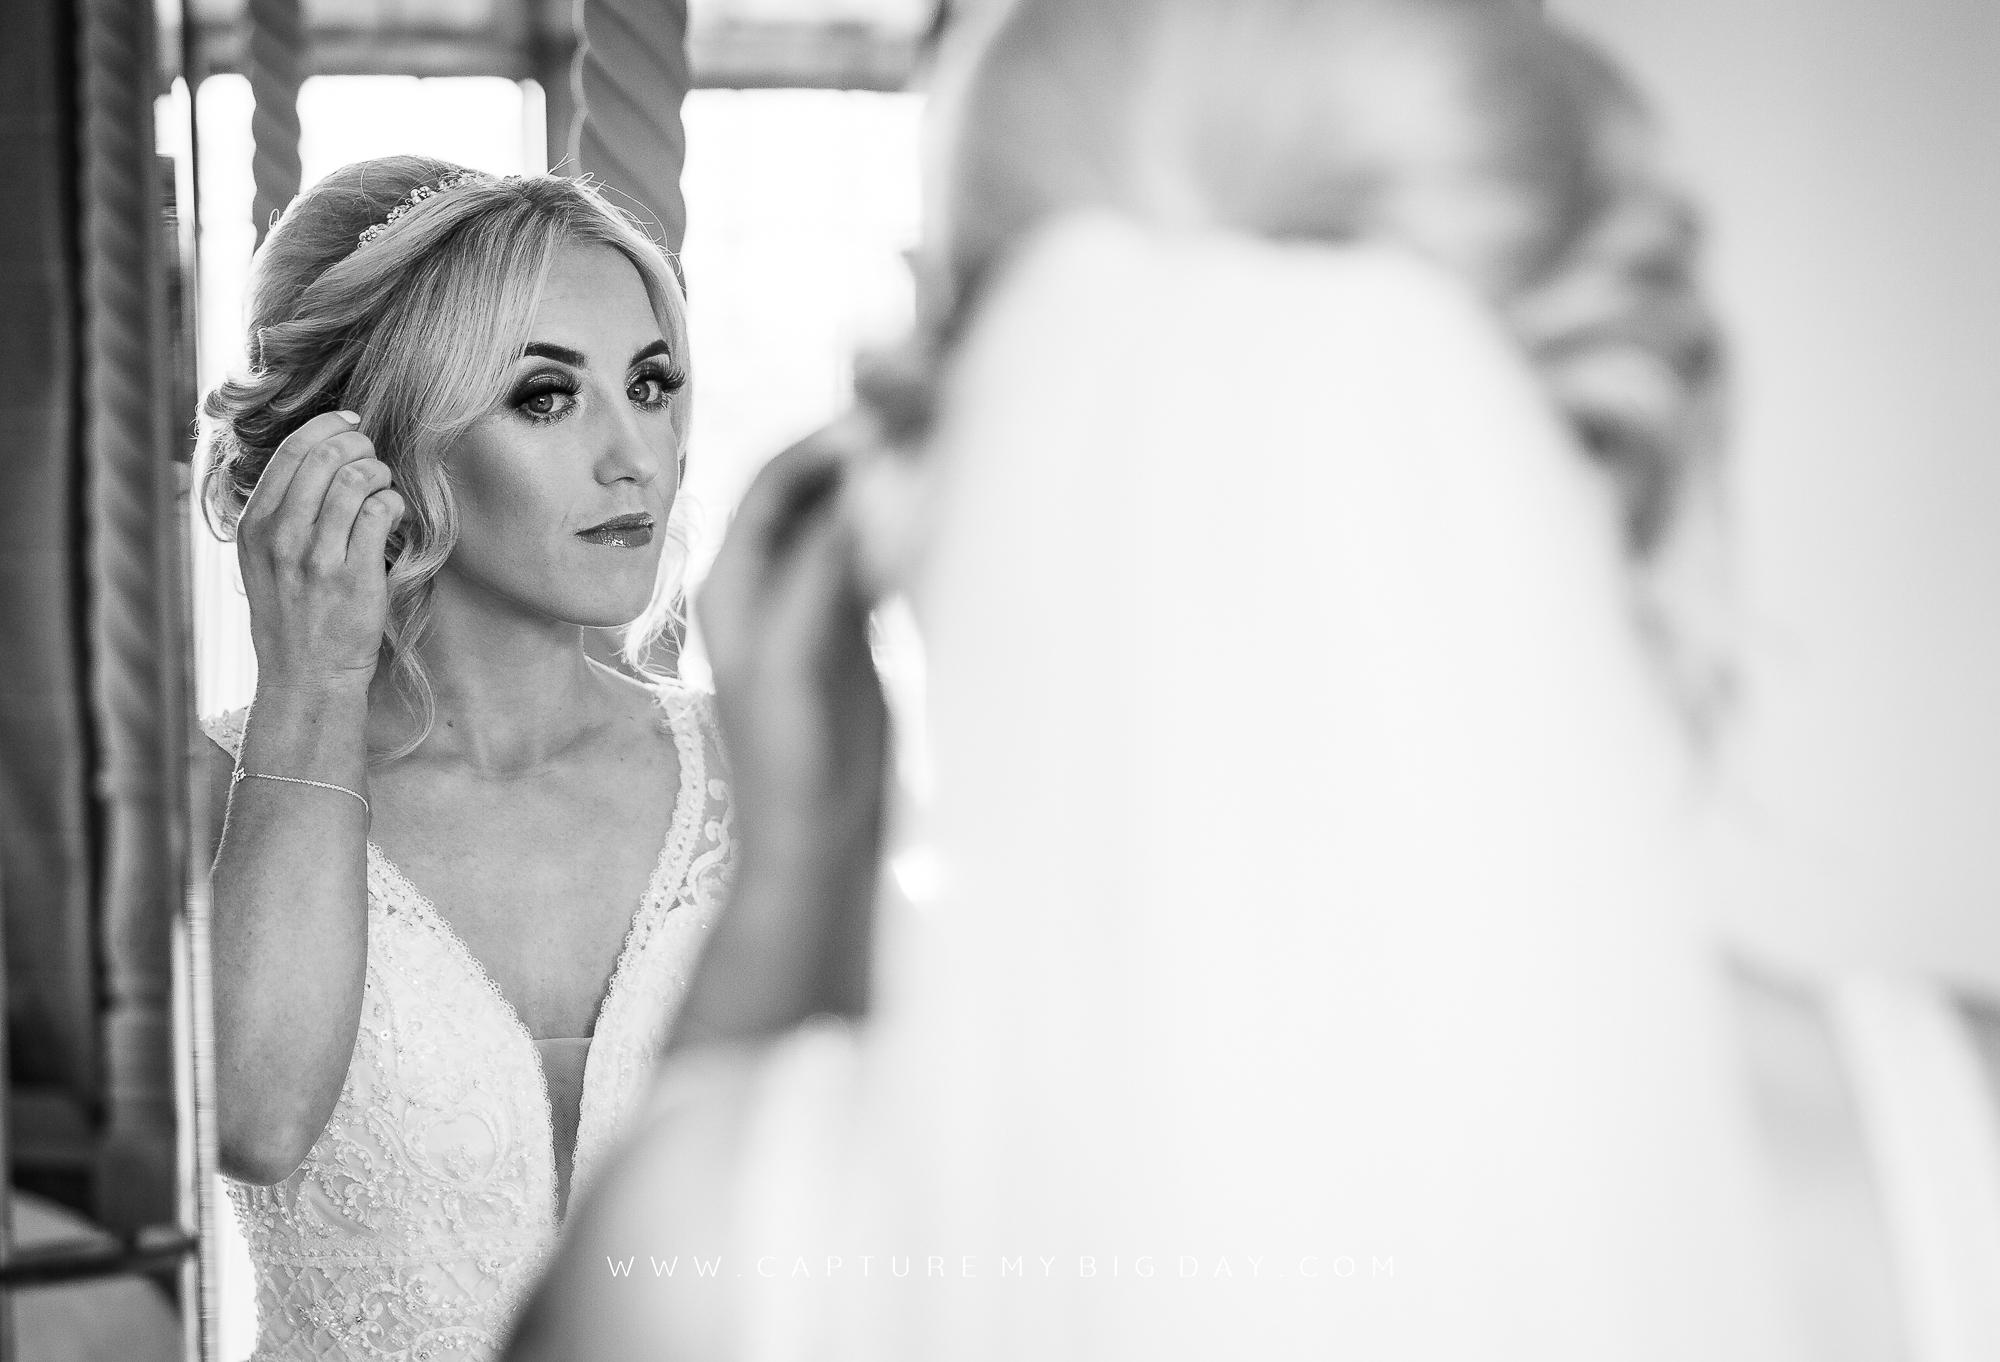 Bride checking hair in mirror